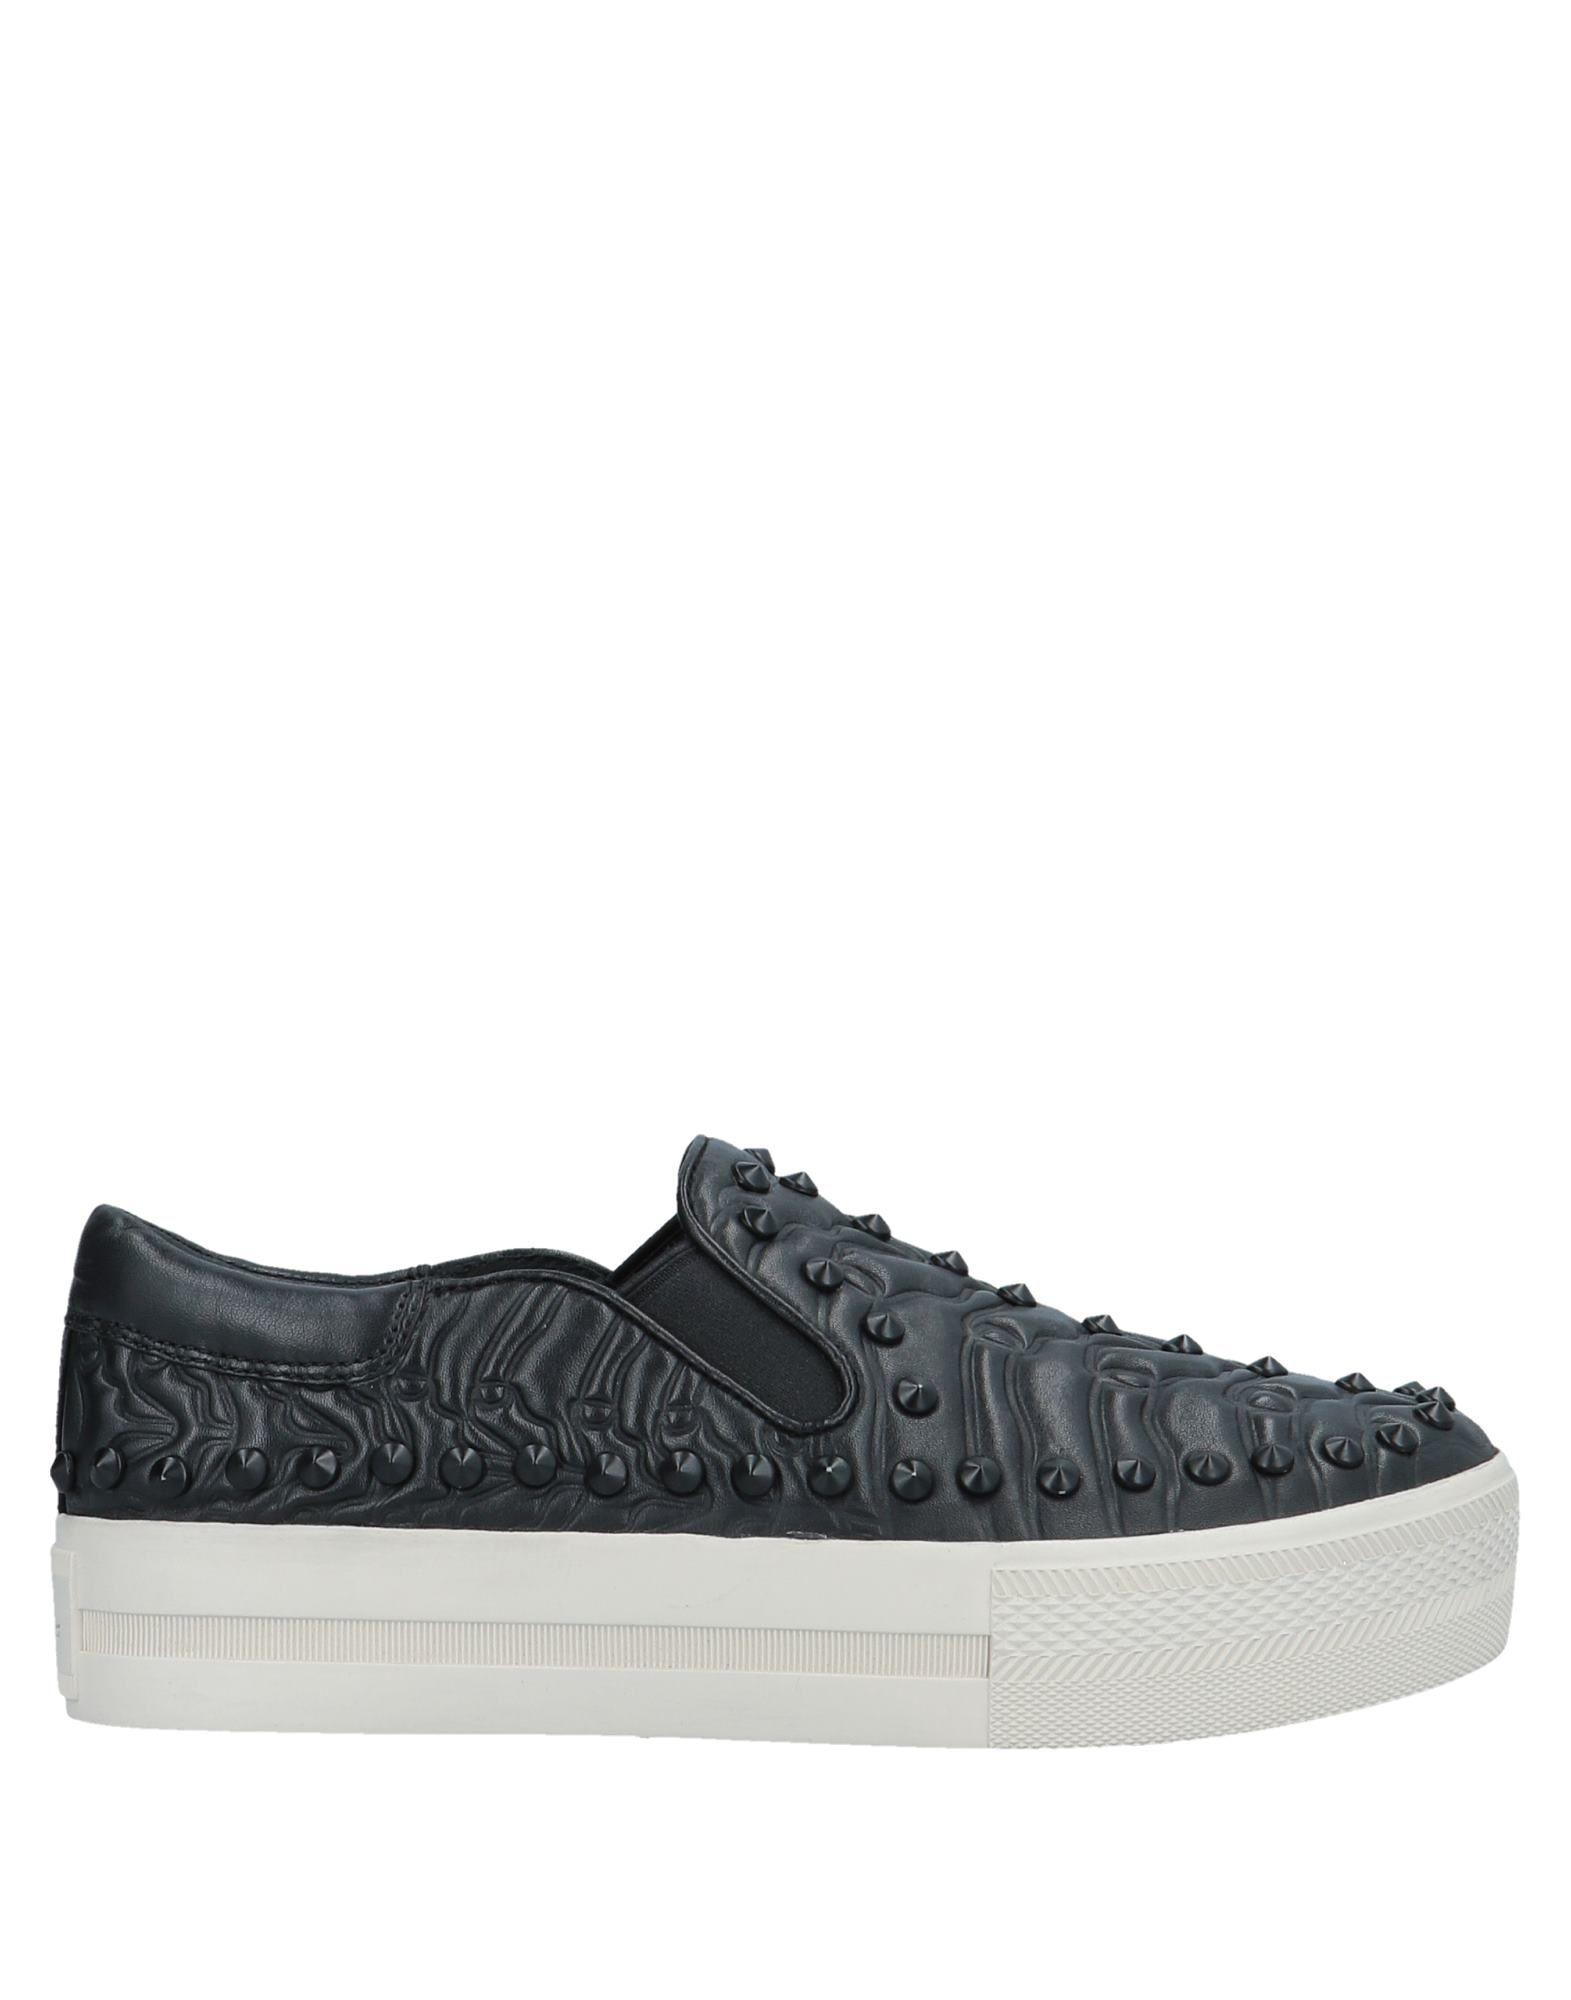 Ash  Sneakers - Women Ash Sneakers online on  Ash United Kingdom - 11557936HK 0a236d